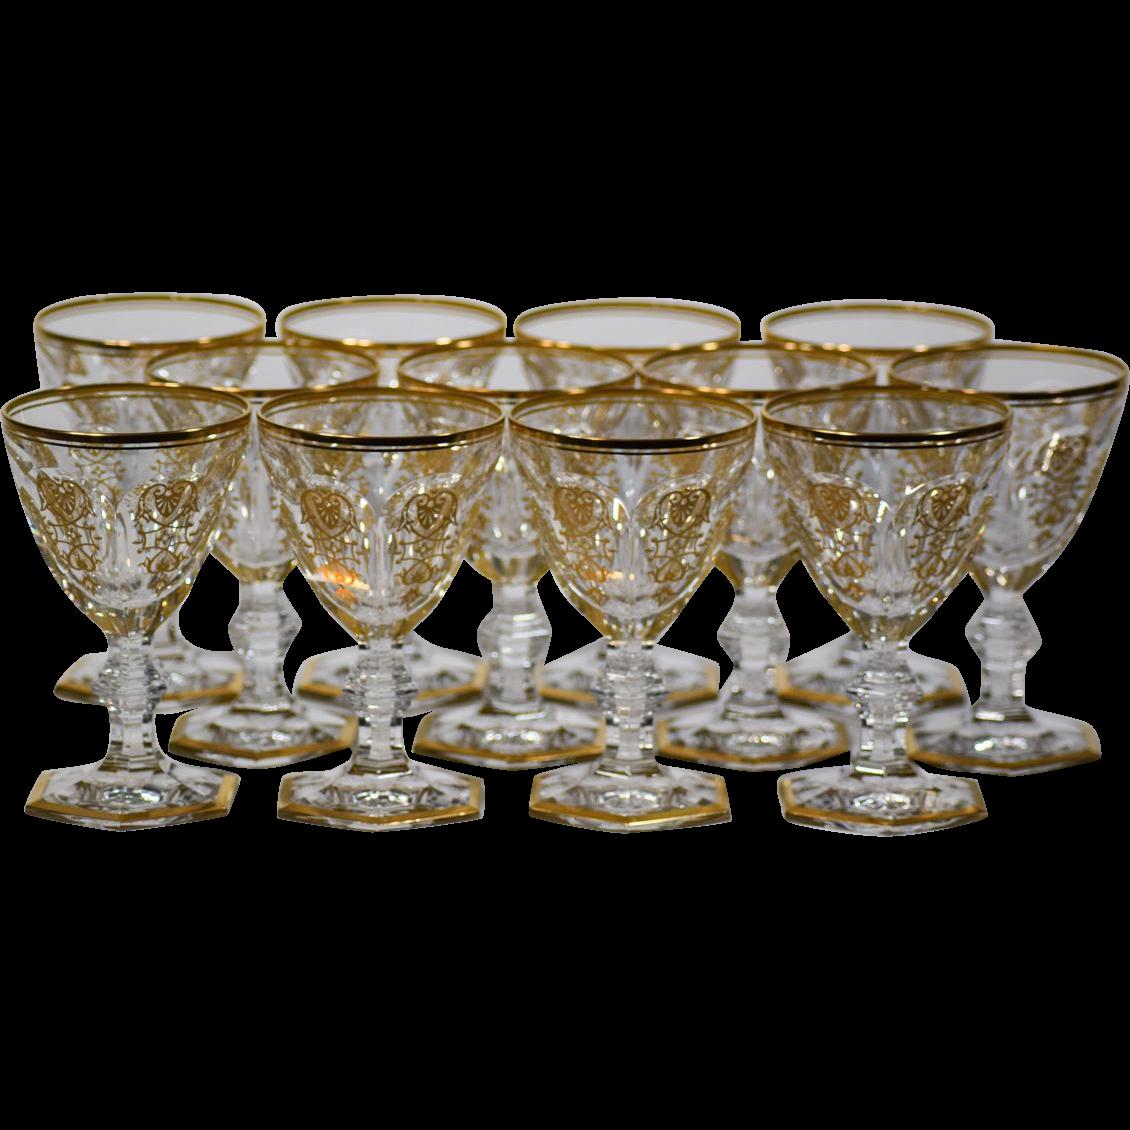 Barzubehör 12 baccarat gilded empire wine glasses